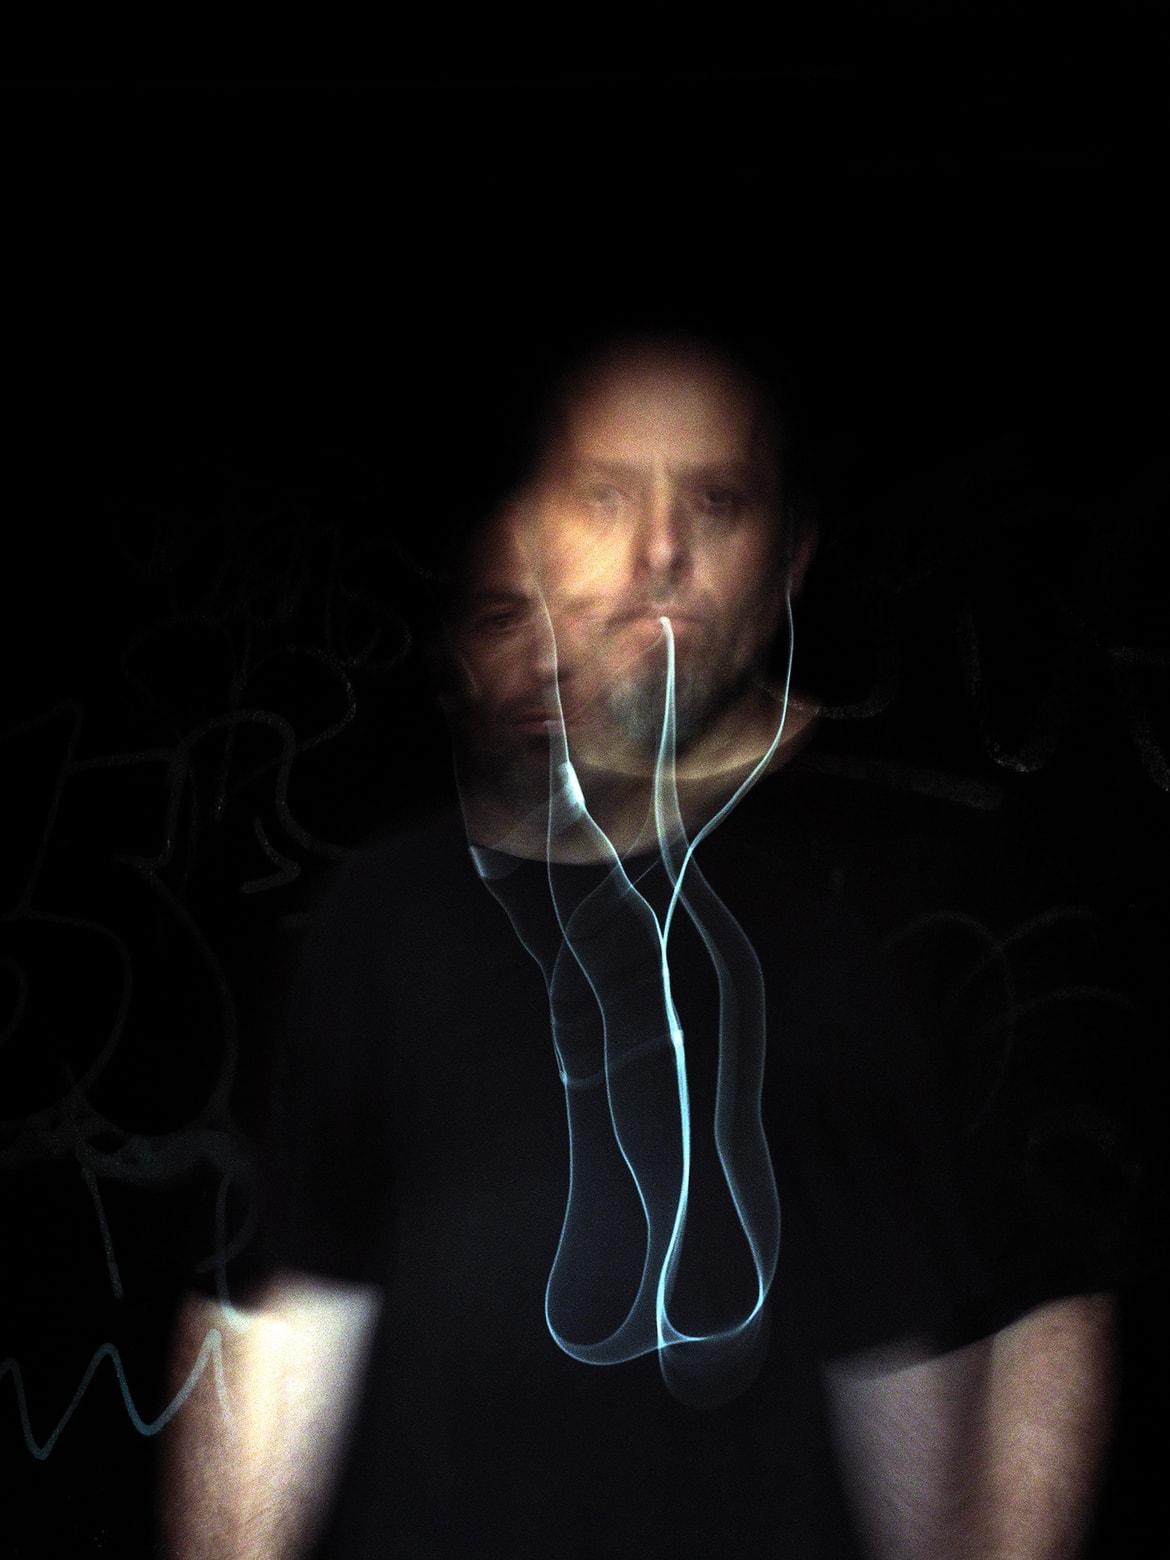 Gary Deirmendjian, 'from  a  dialogue  within',  2010,  giclée  print,  80  x  60  cm,  edition  of  7  +  1  A.P